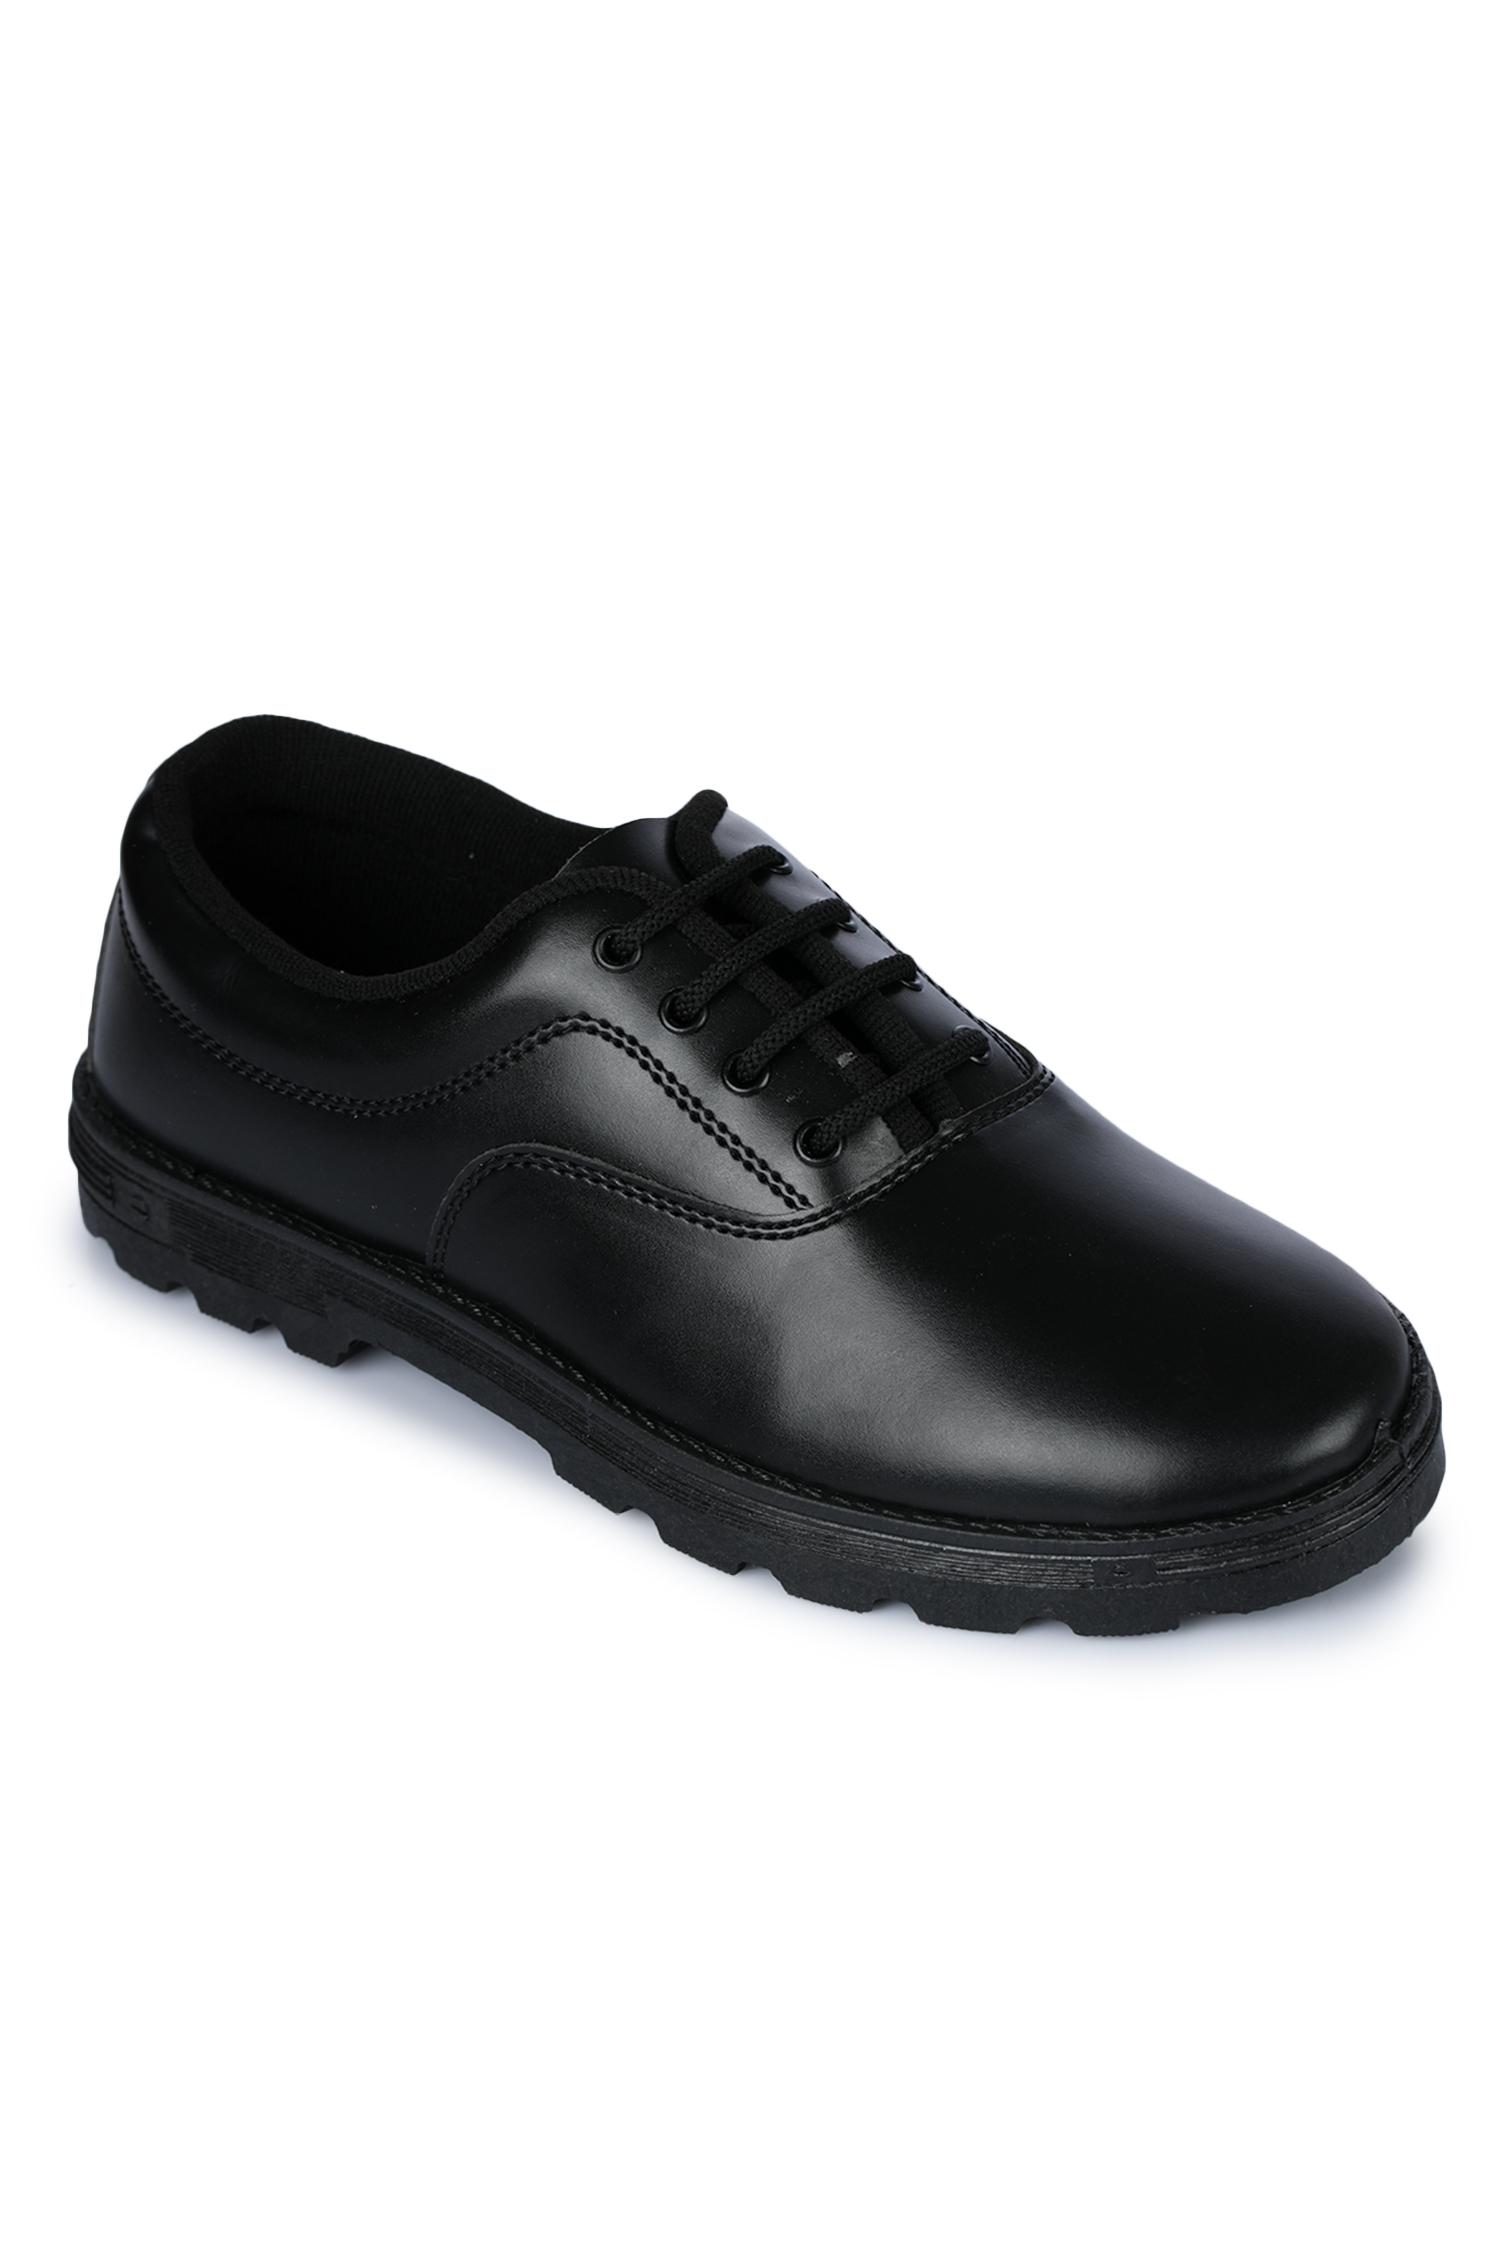 Liberty | Liberty PREFECT School Shoes S BOY A_BLACK For - Men